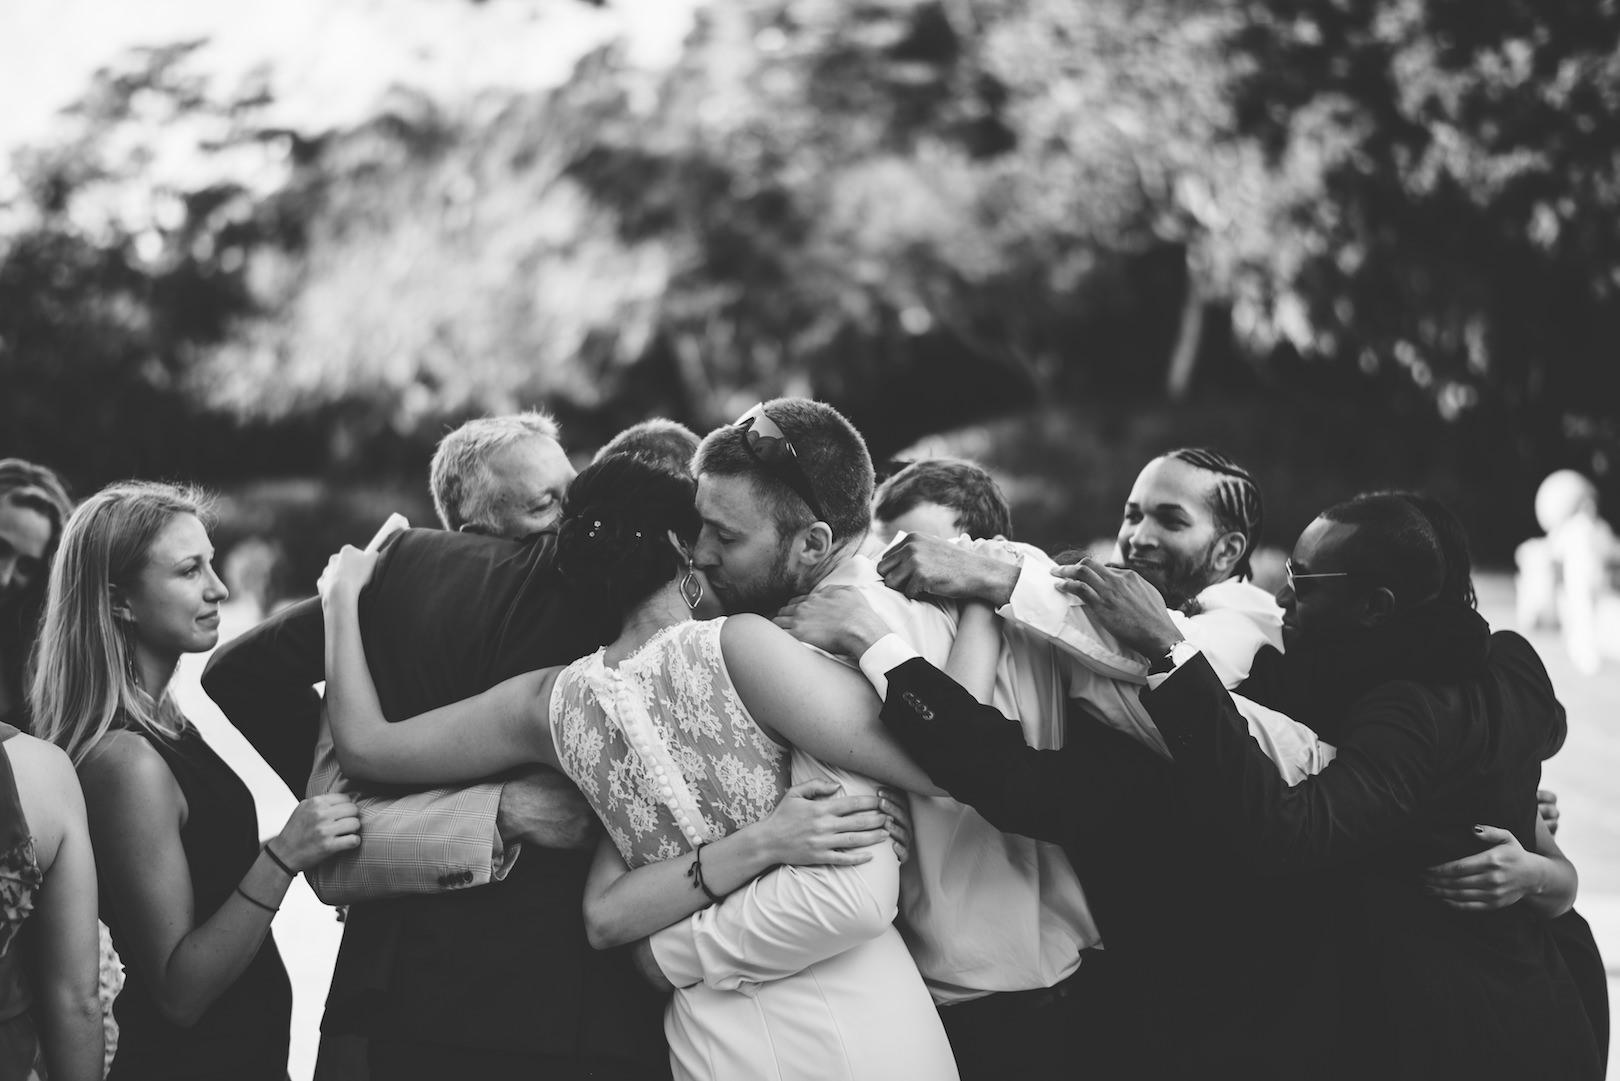 Nathan & Felicia - Wedding Day - © Dallas Kolotylo Photography - 357